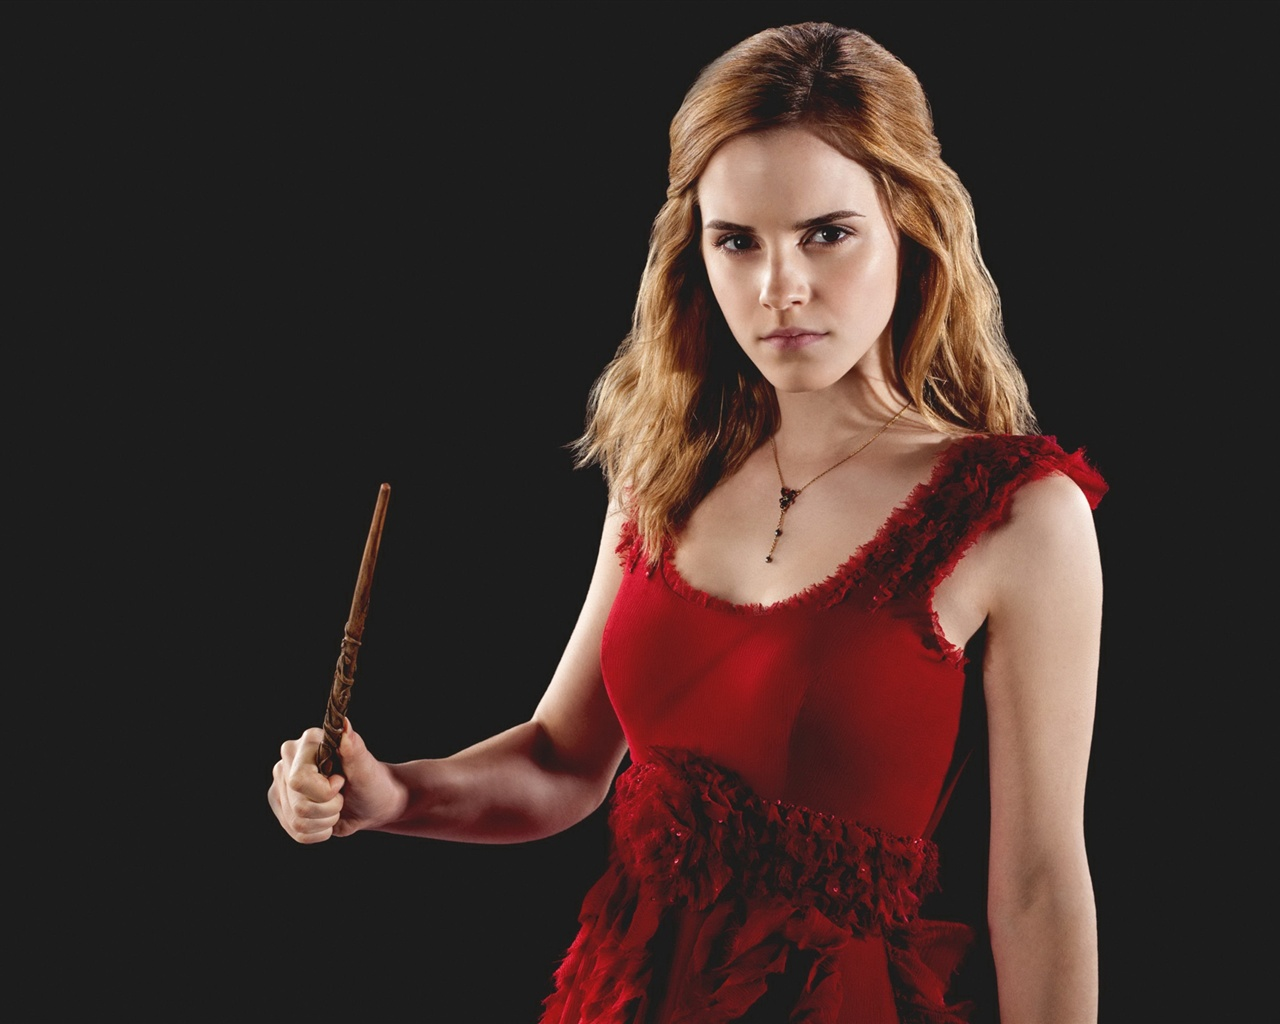 Emma-Watson-25_1280x1024.jpg Emma Watson